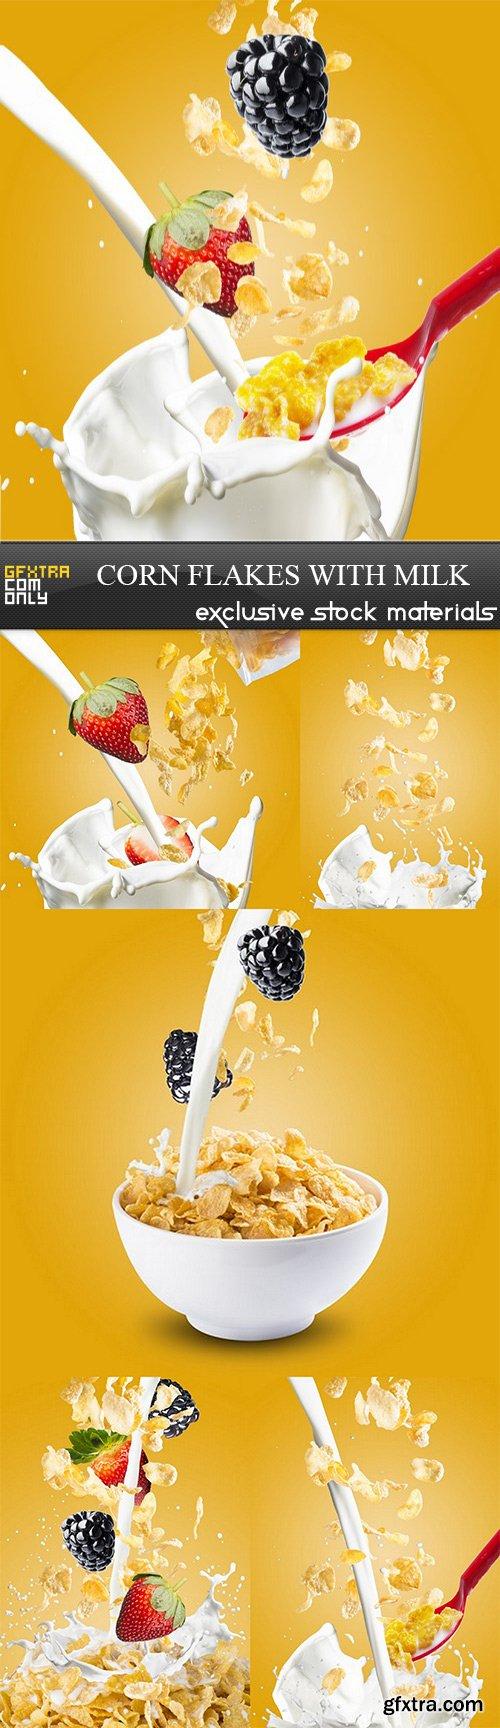 Corn Flakes with Milk - 6 UHQ JPEG